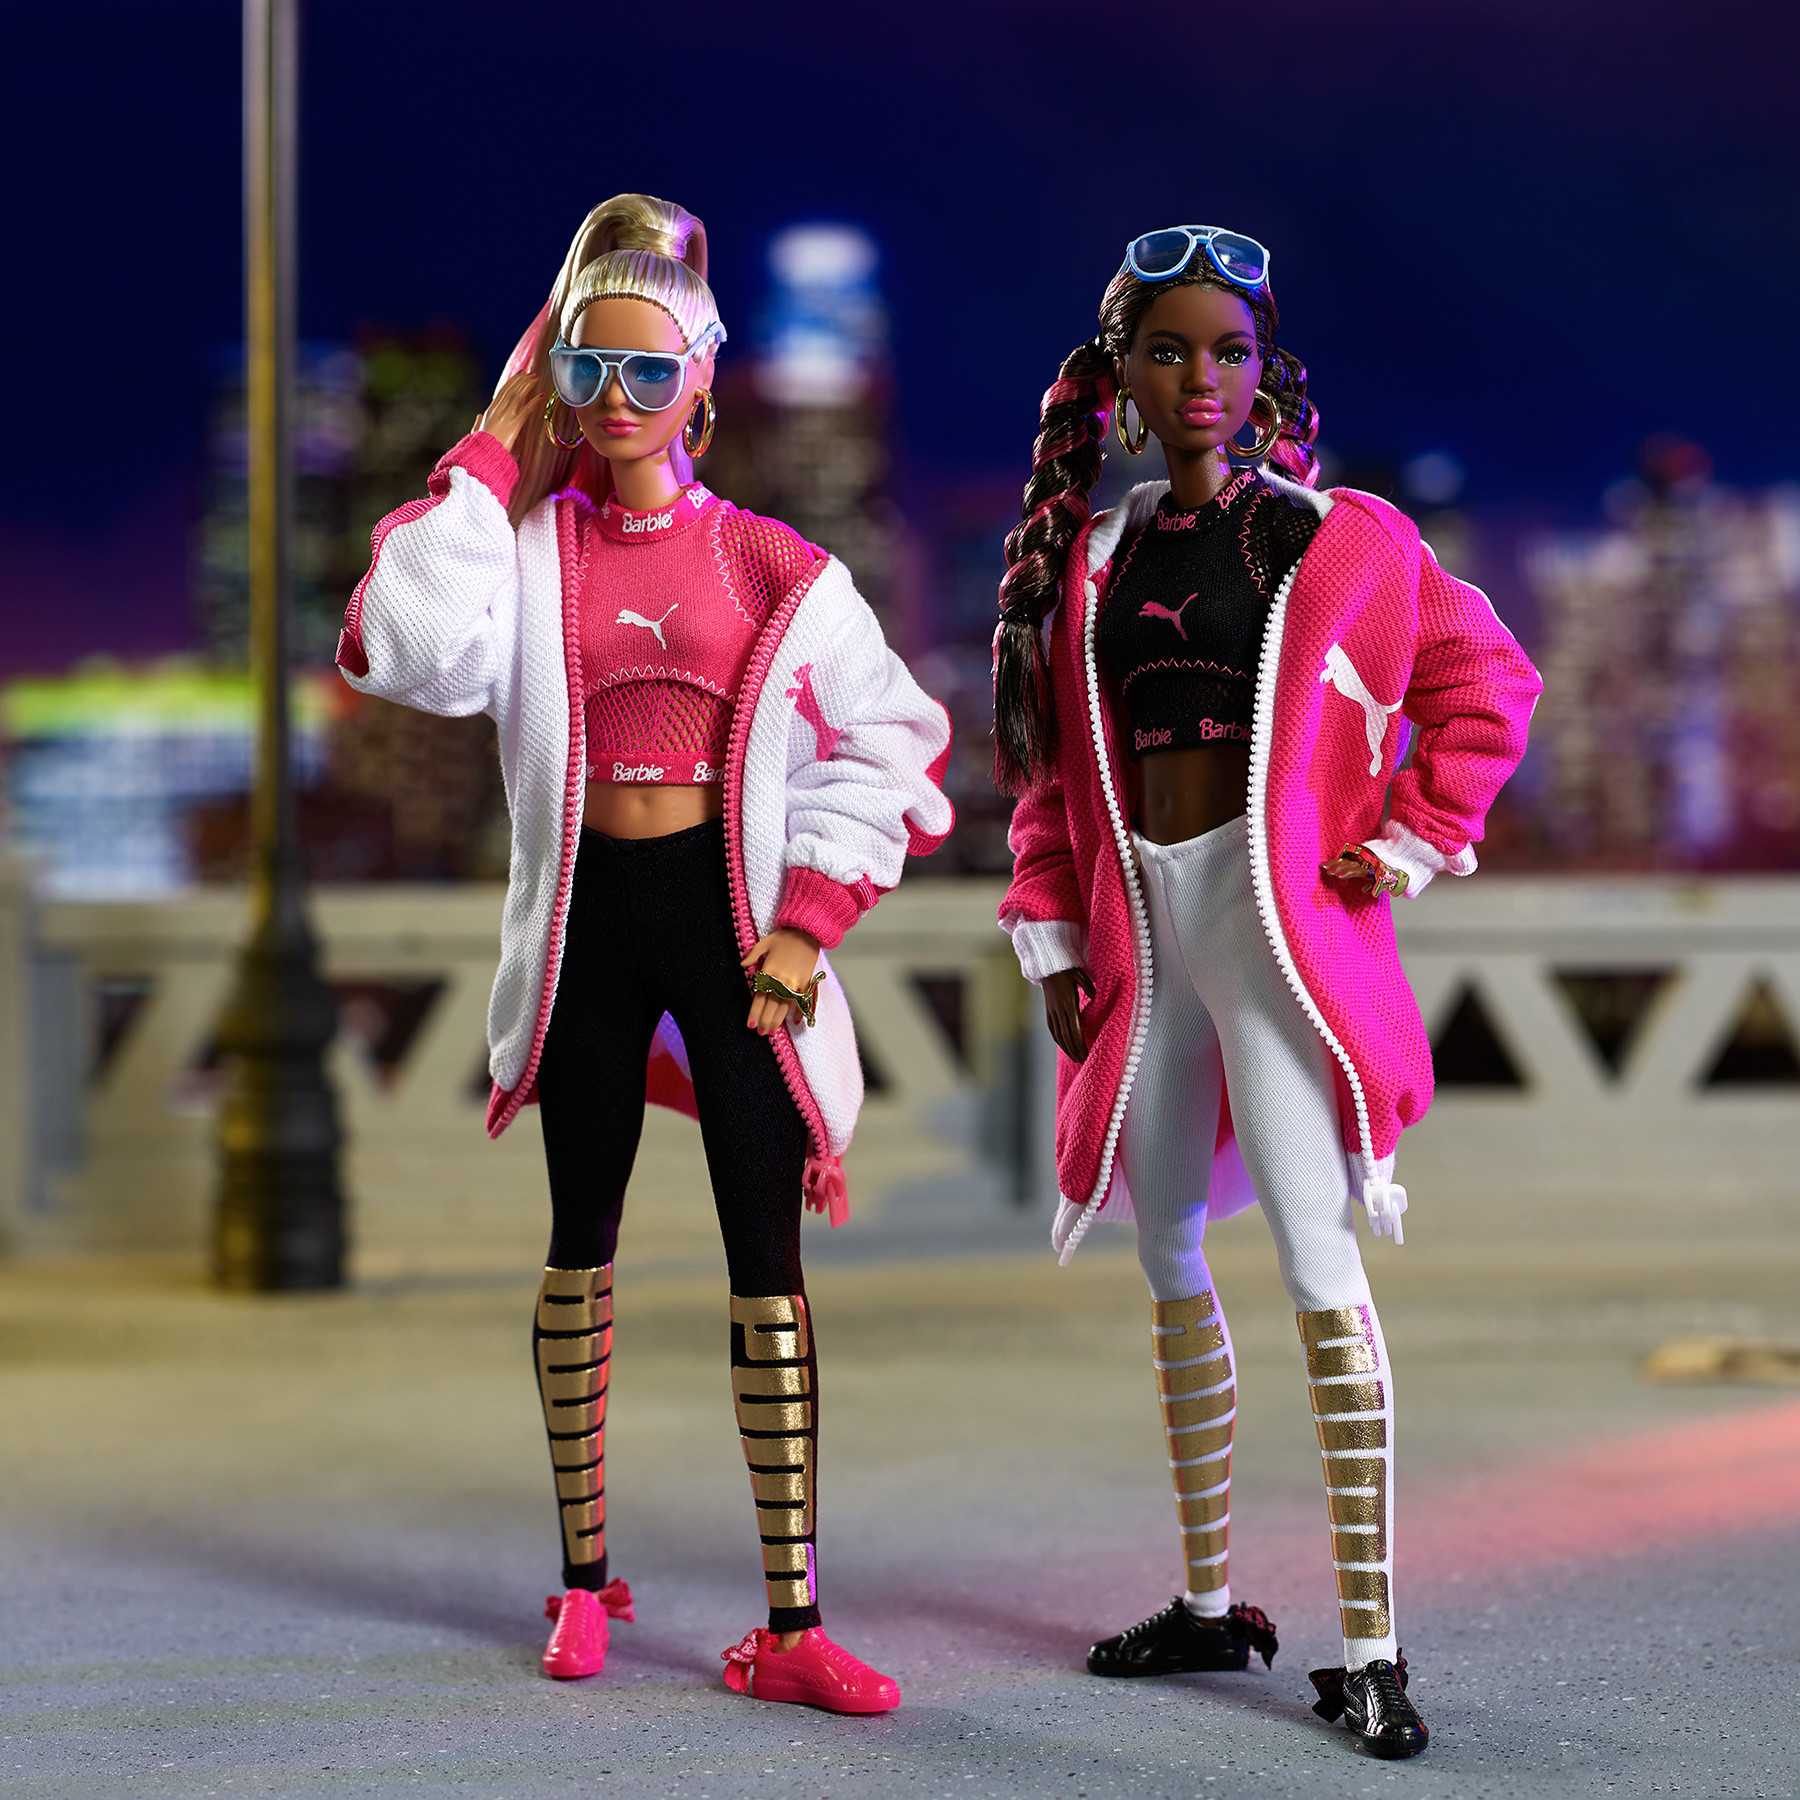 PUMA X Barbie launch new shoe doll line – PUMA BARBIE DOLLS